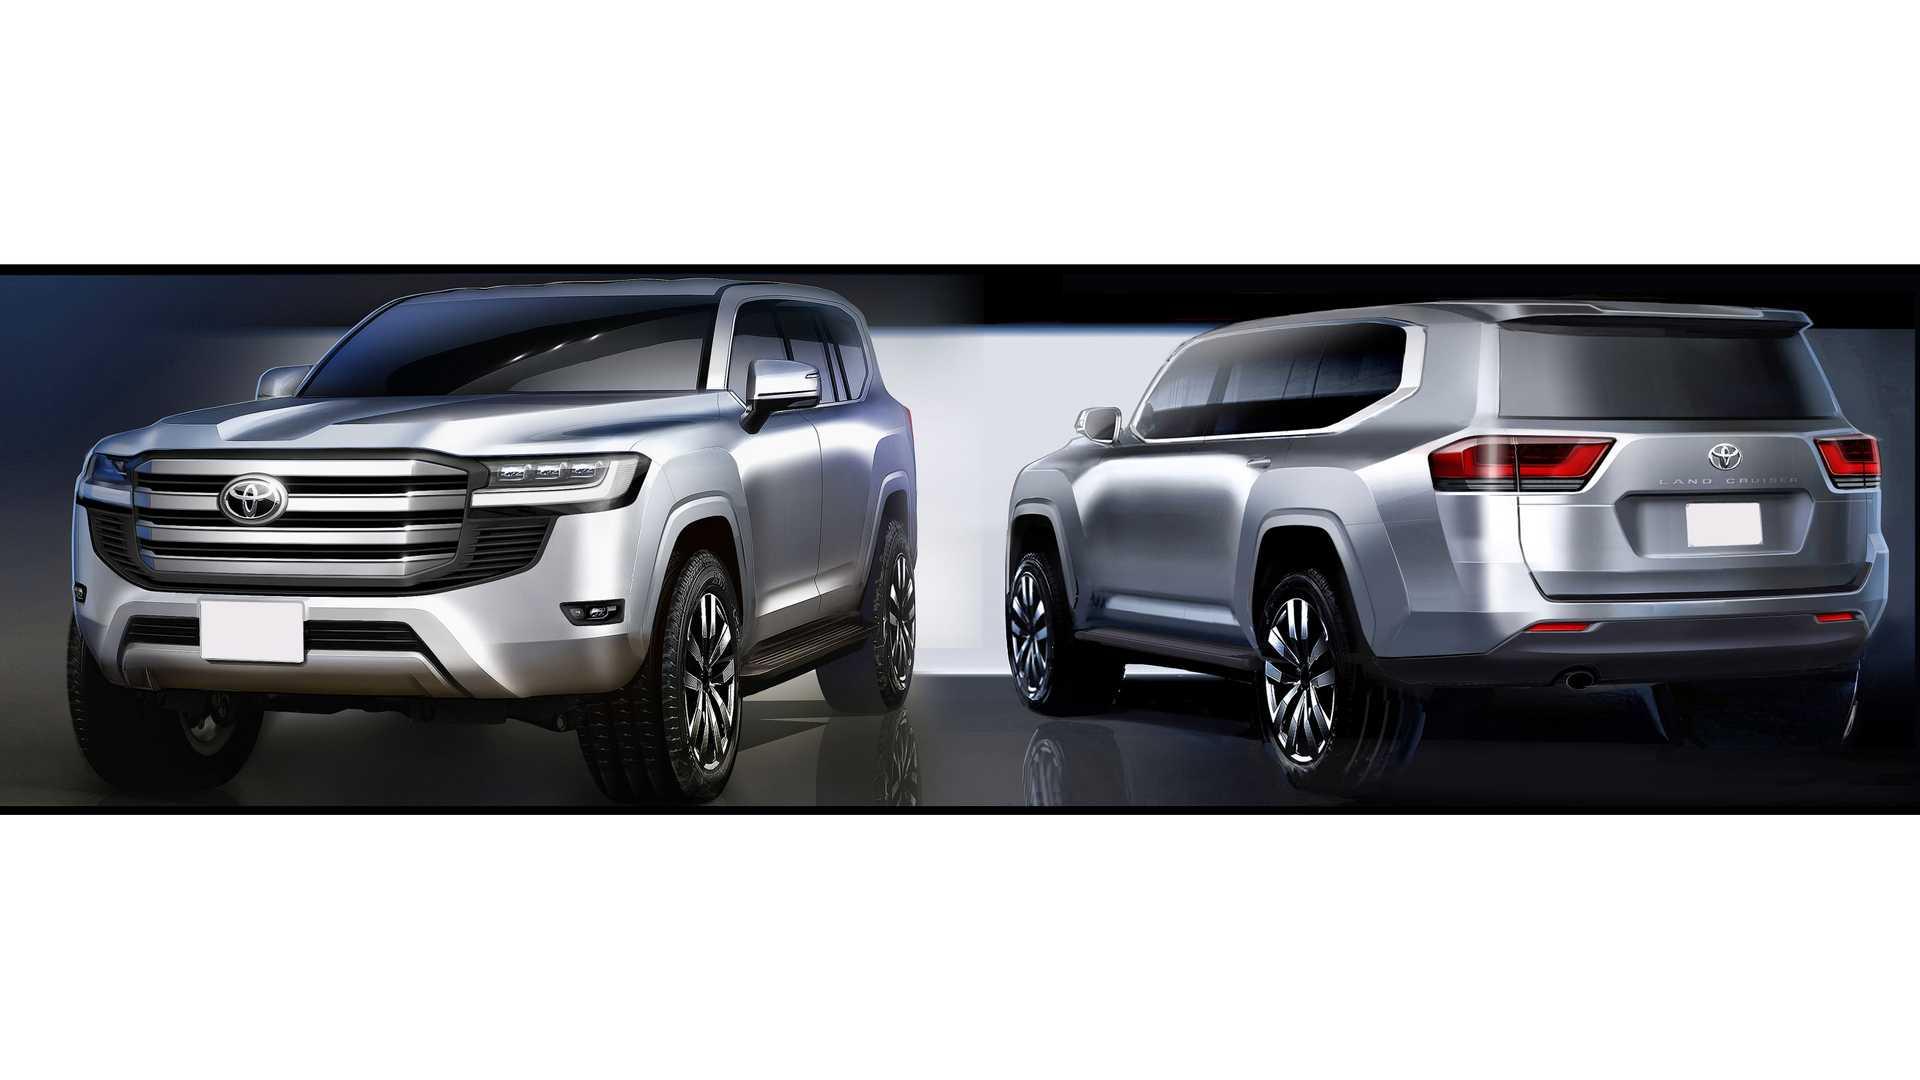 Toyota-Land-Cruiser-design-sketches-11